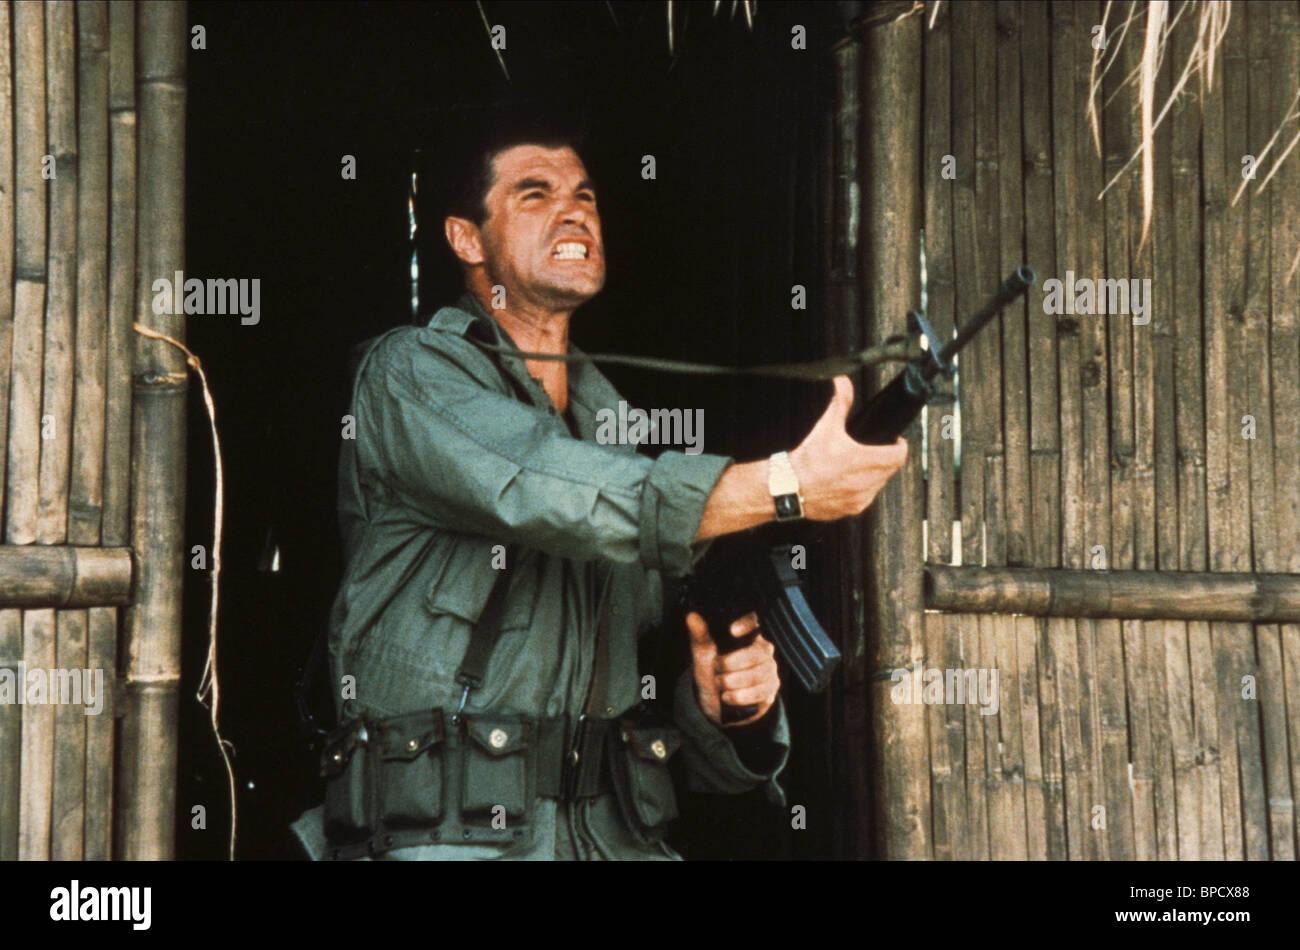 Oliver tobias cobra mission 1986 stock photo royalty for Cobra mission